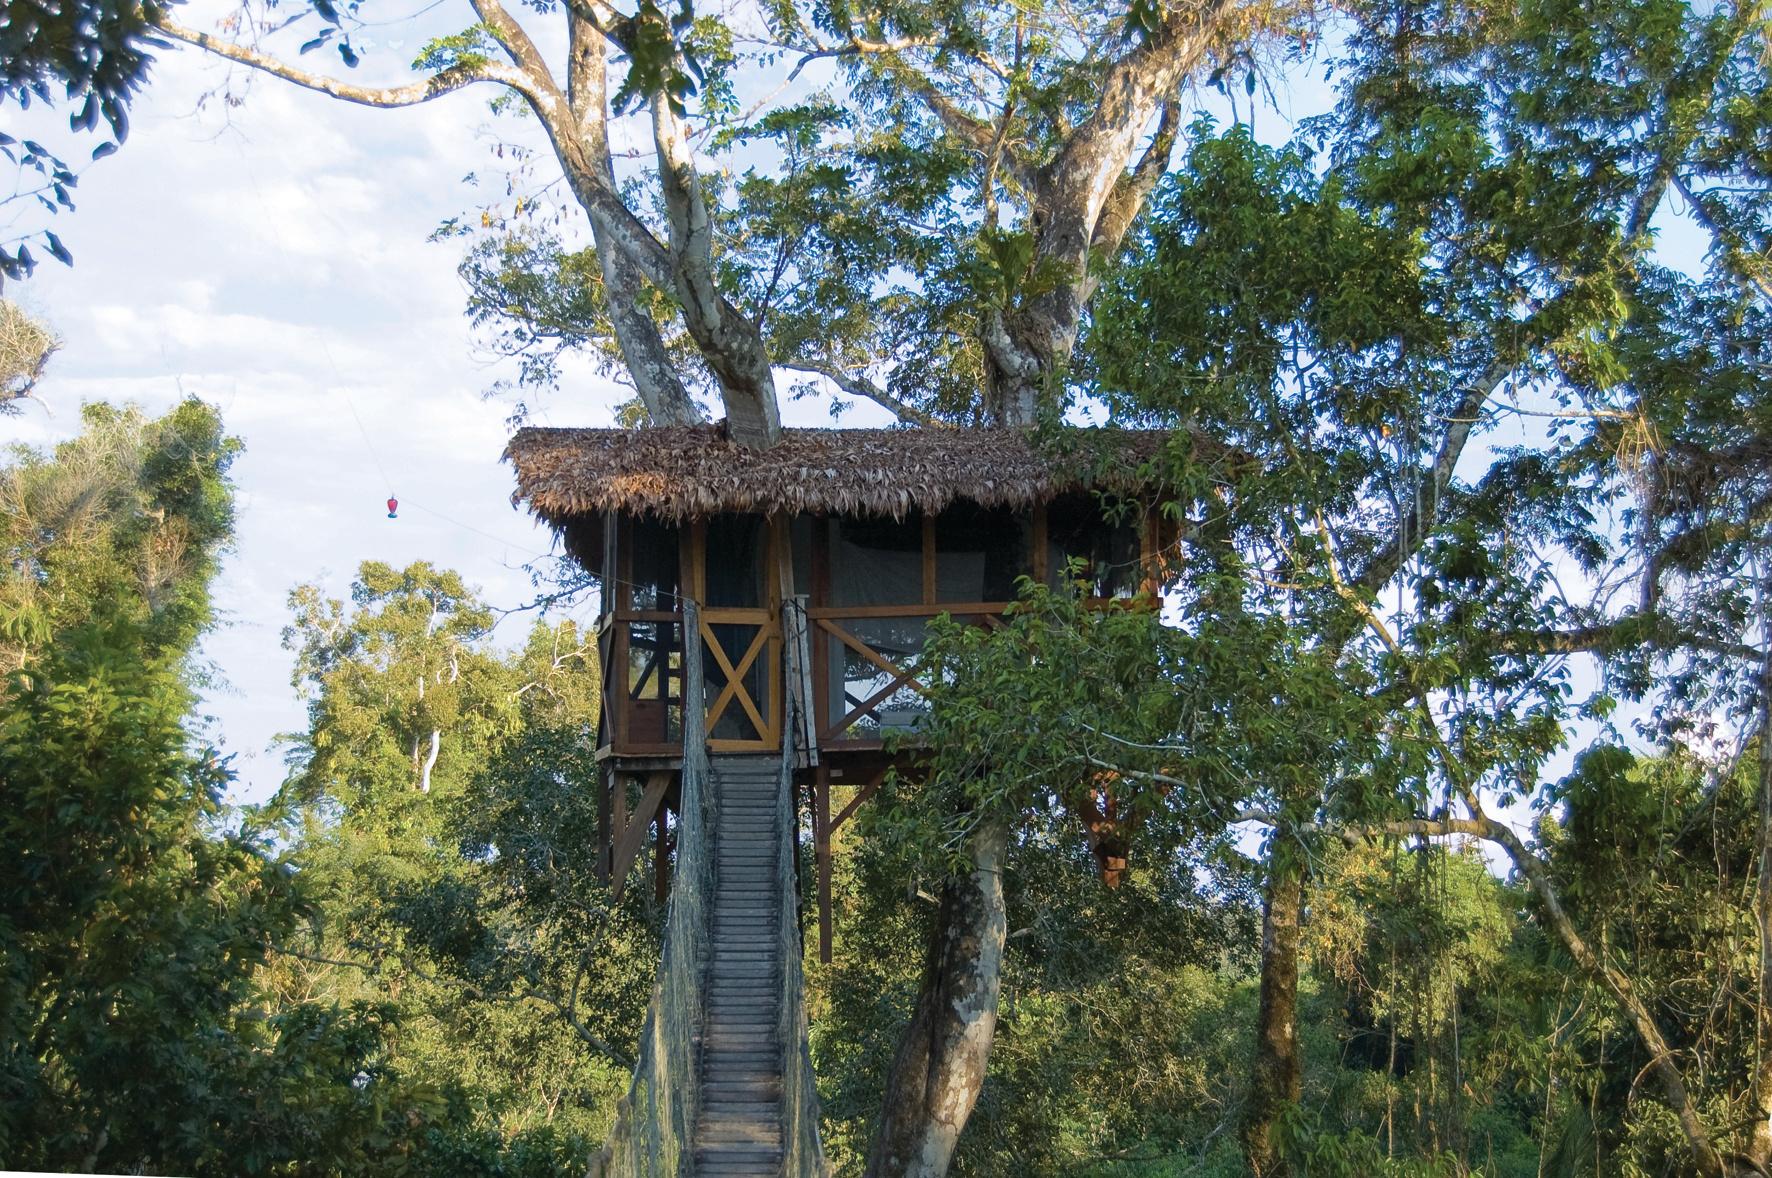 canopy-treehouse-reserva-amazonica